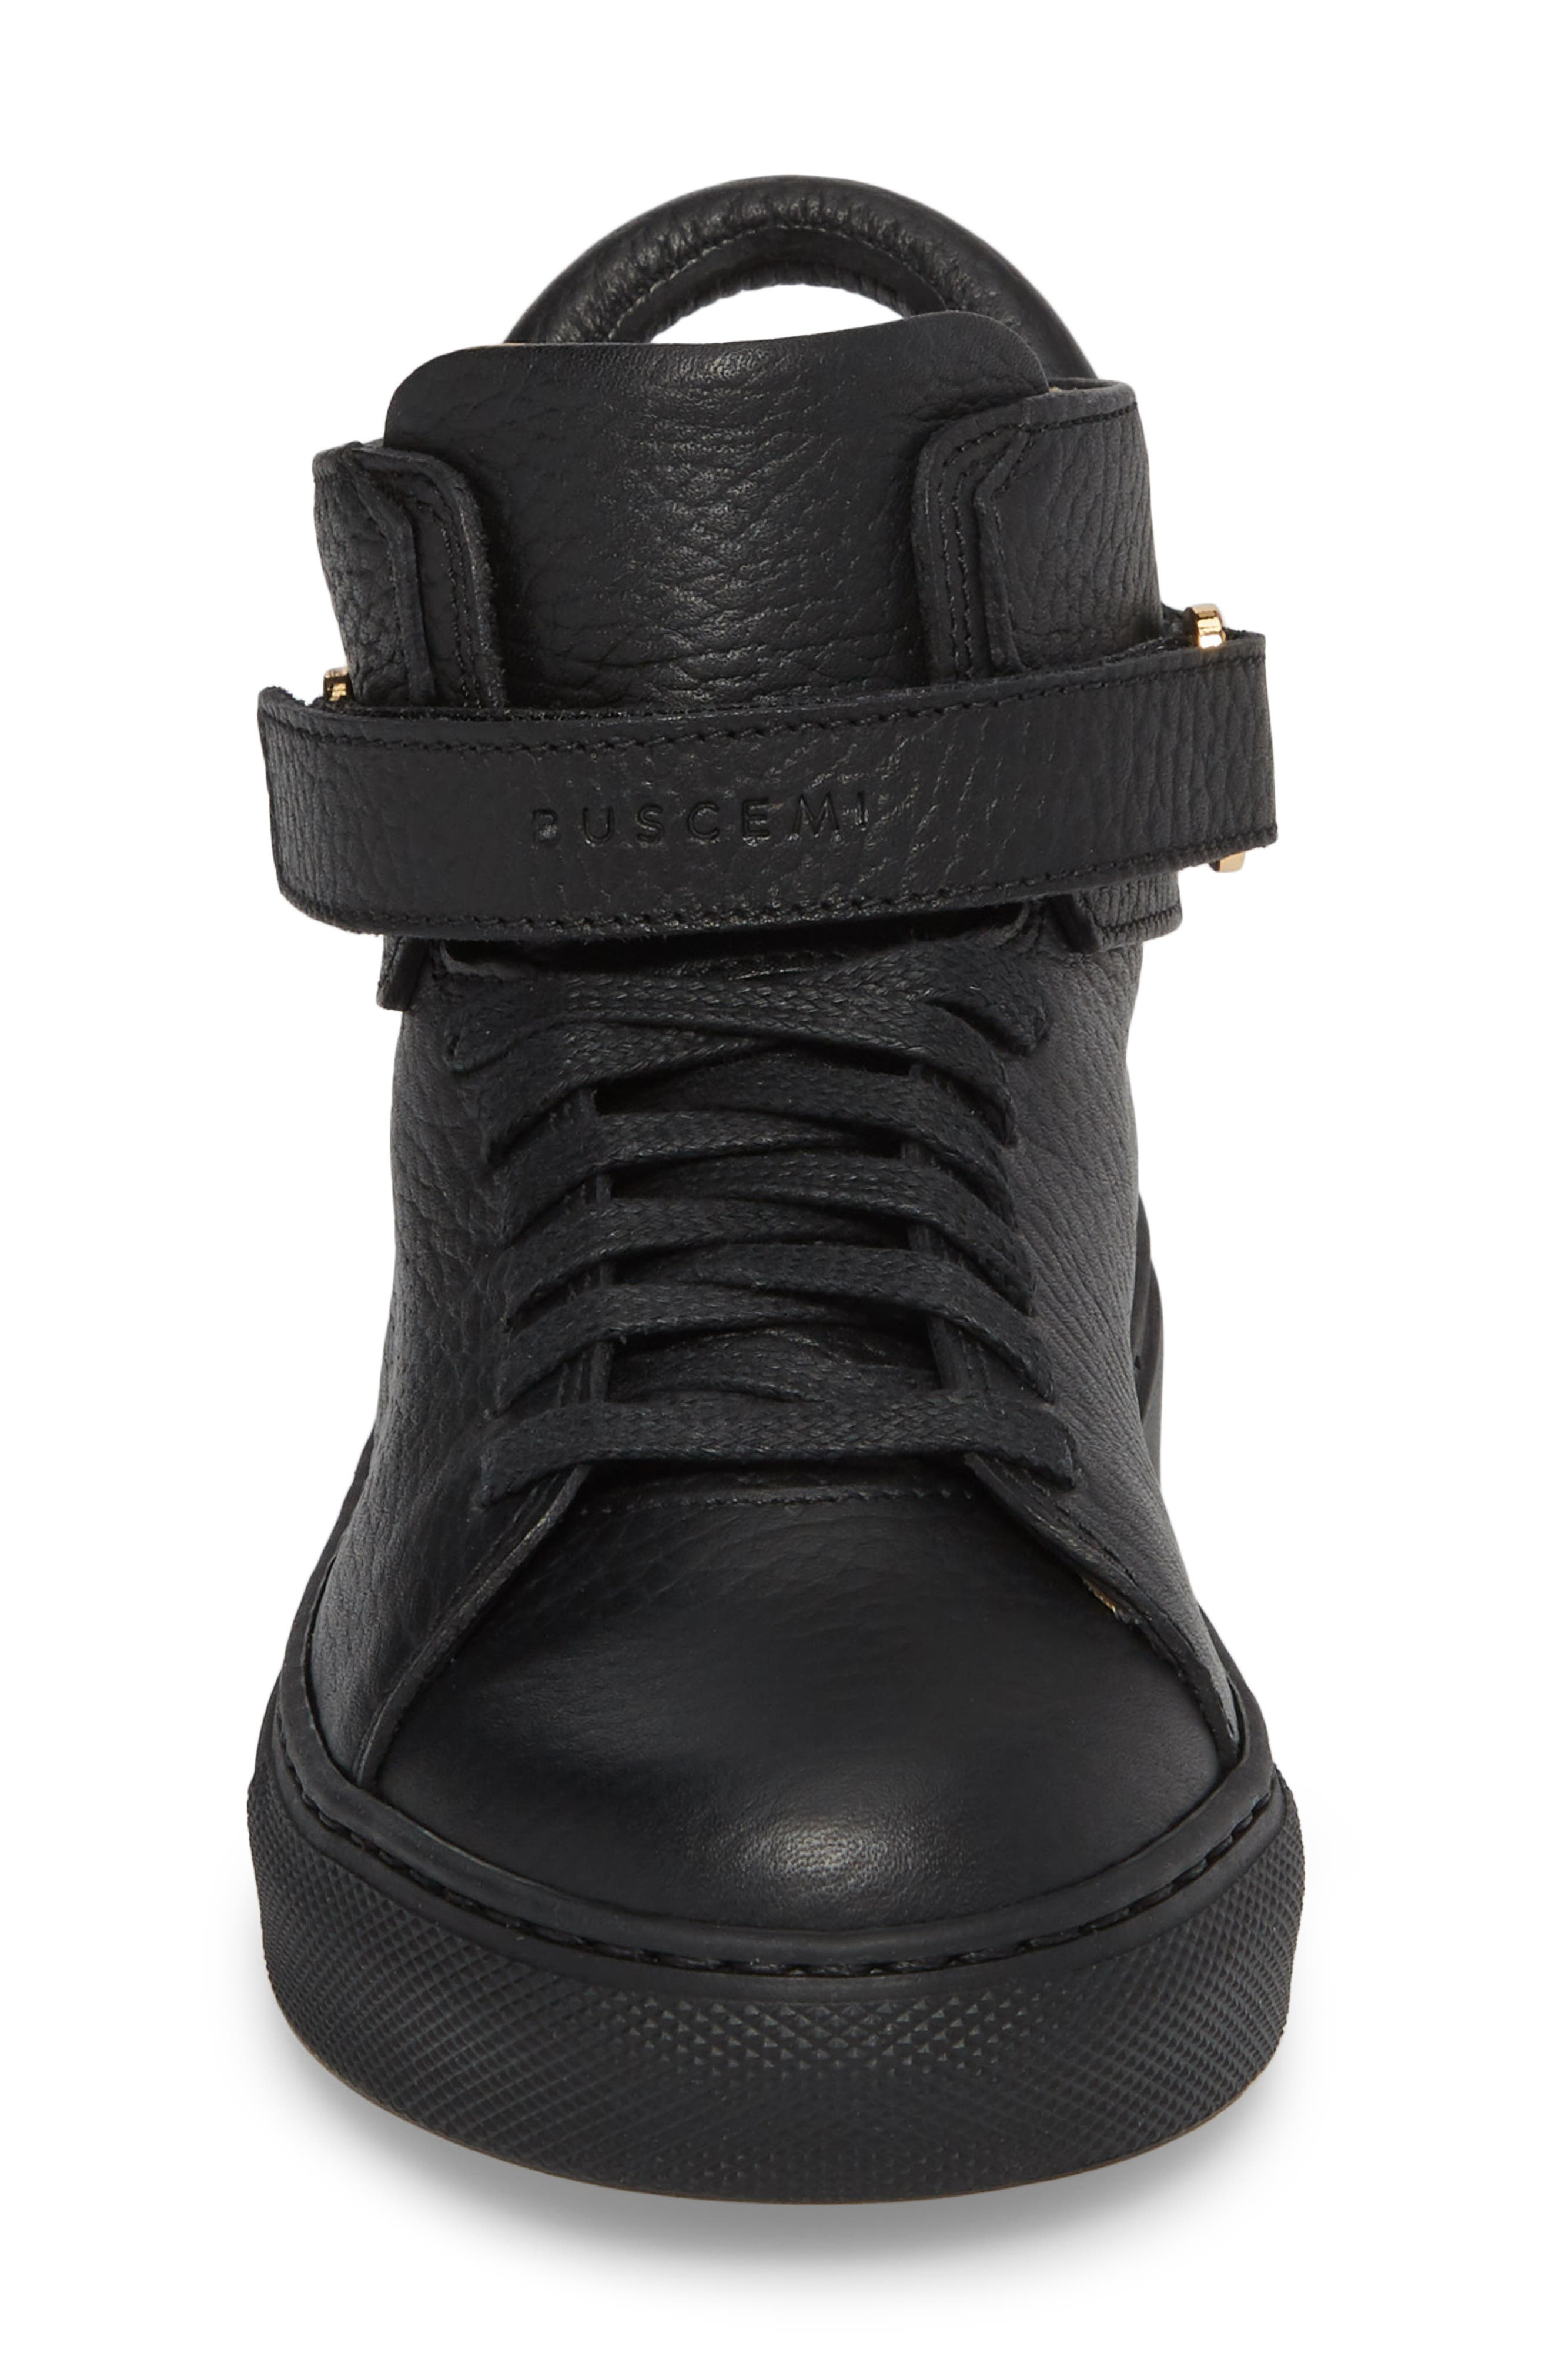 High Top Sneaker,                             Alternate thumbnail 4, color,                             Black